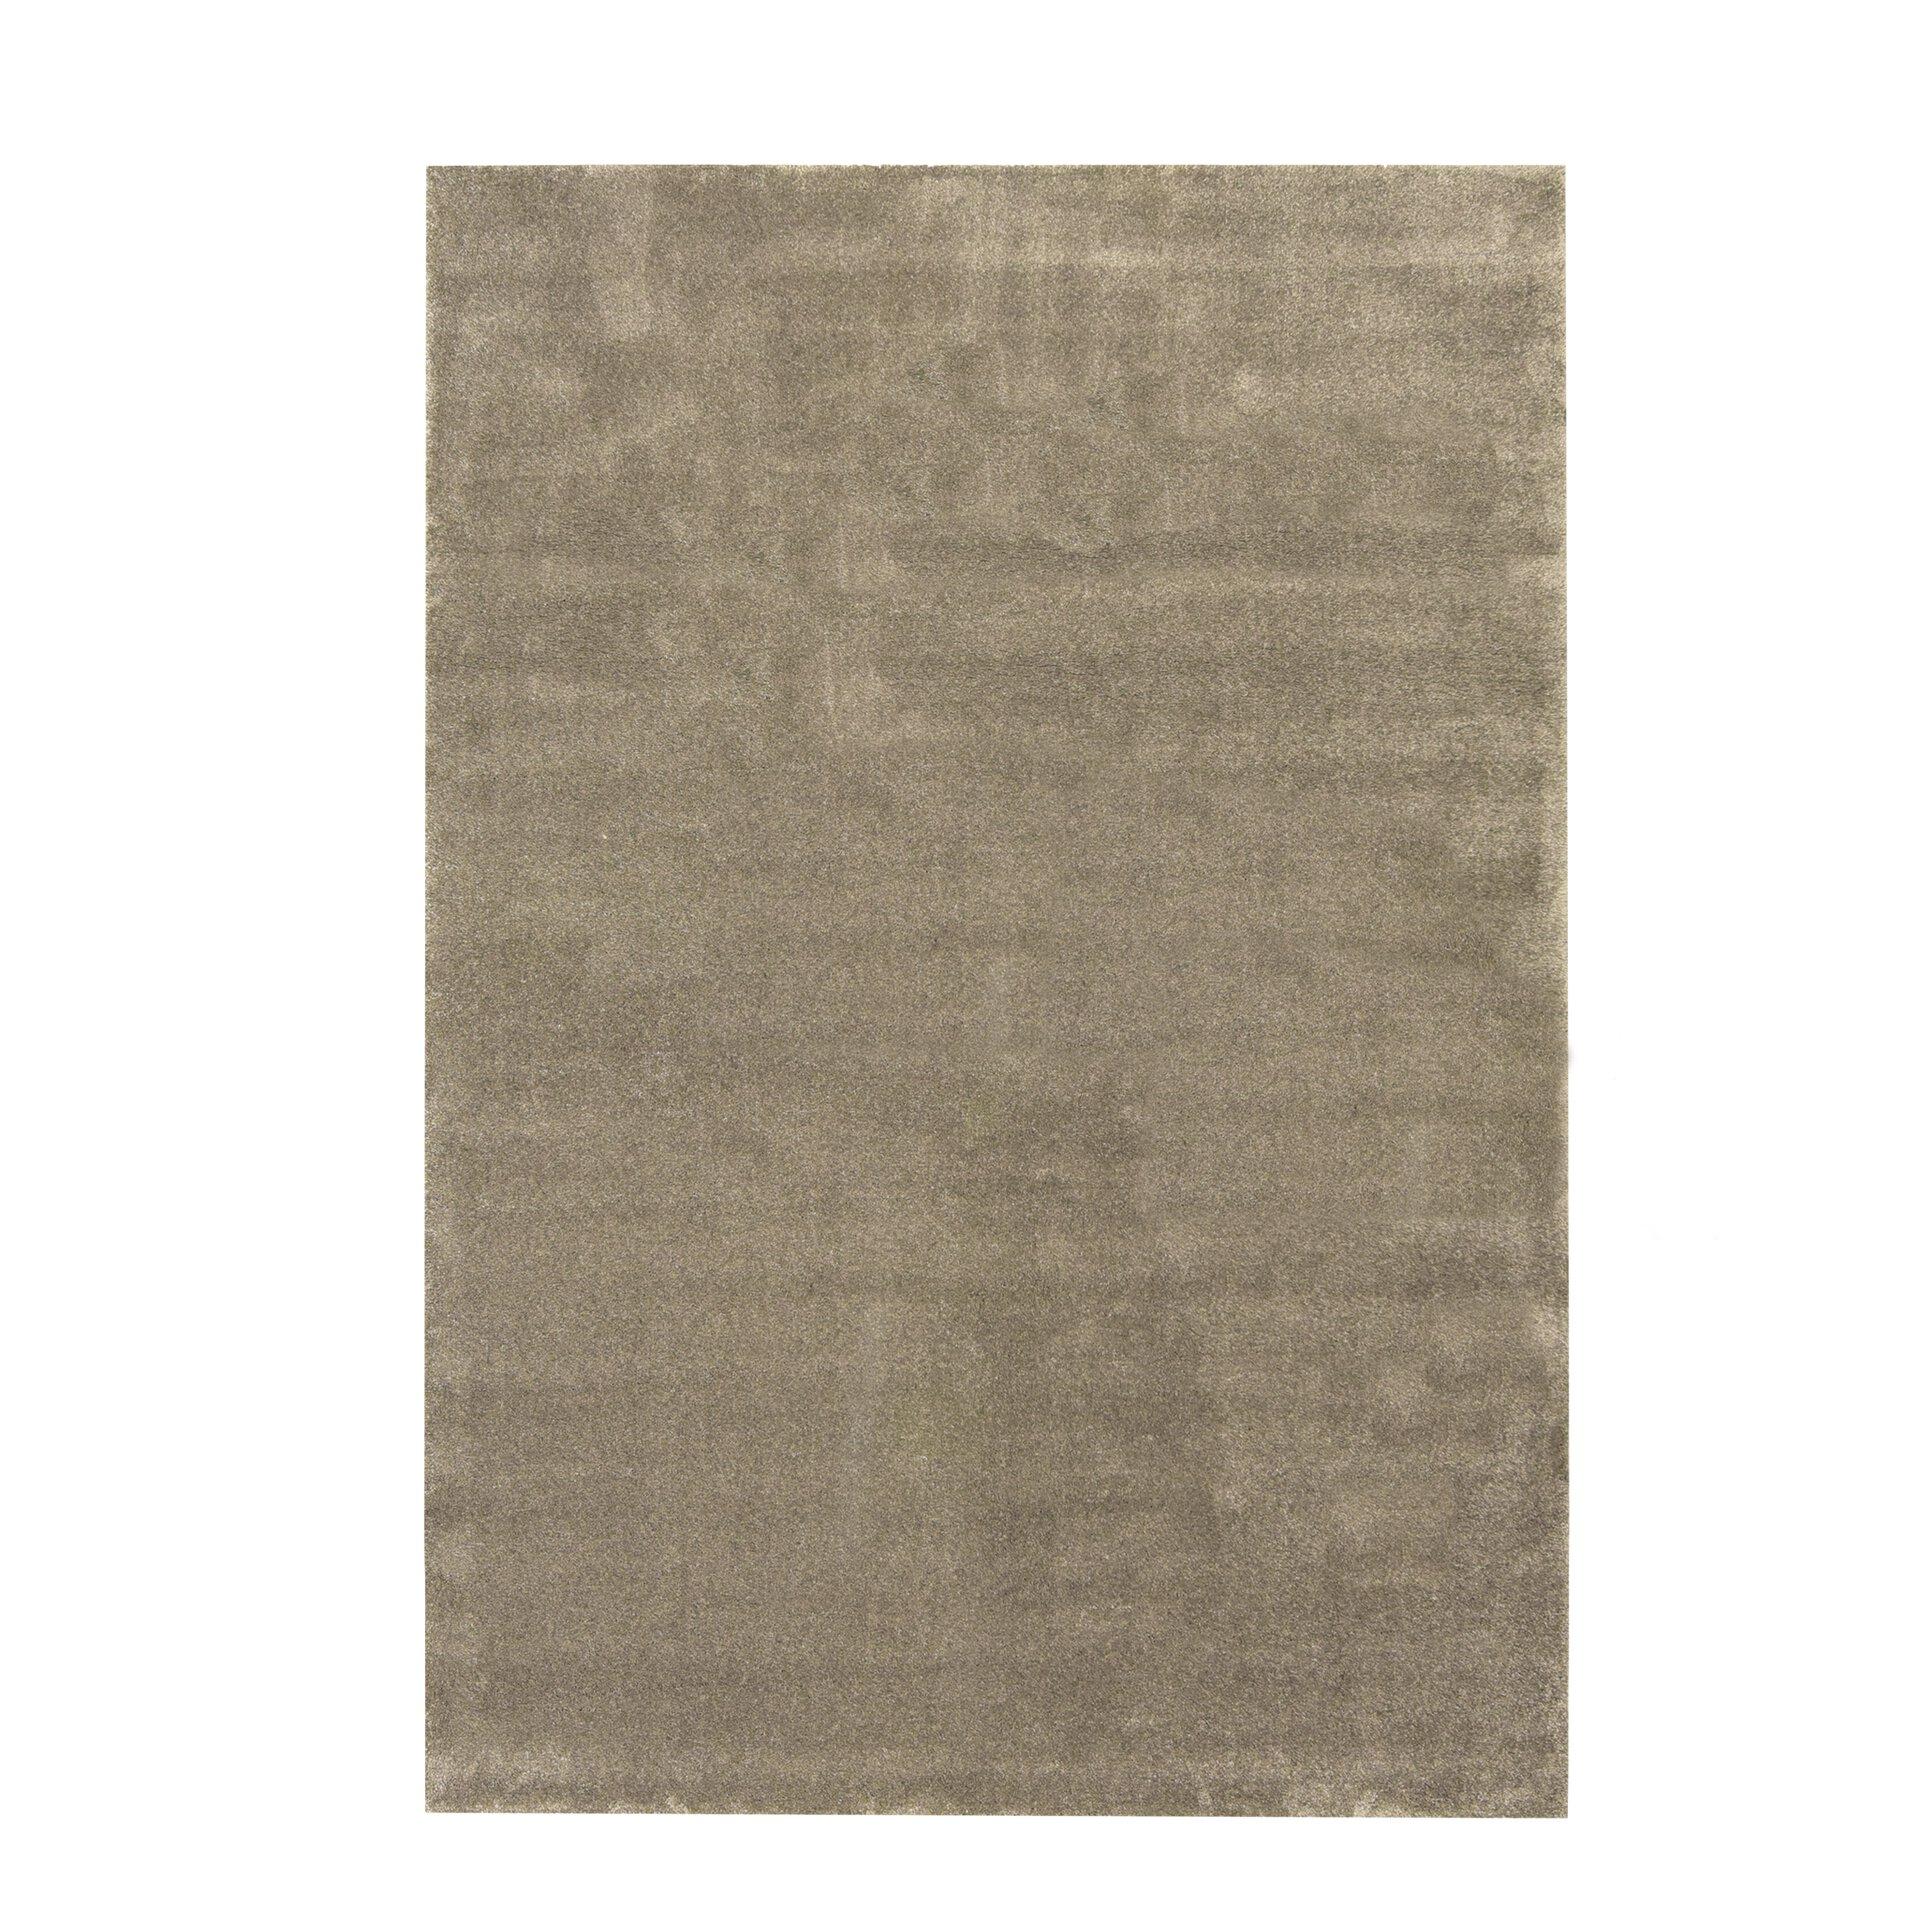 Maschinenwebteppich Montana BG Sense merinos Textil grau 1 x 1 cm